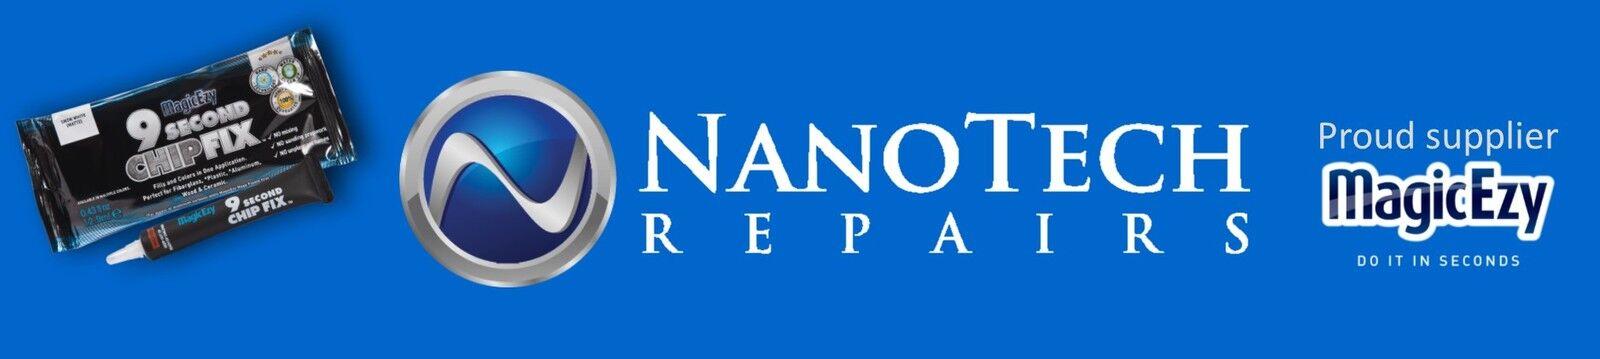 NANOTECH REPAIRS